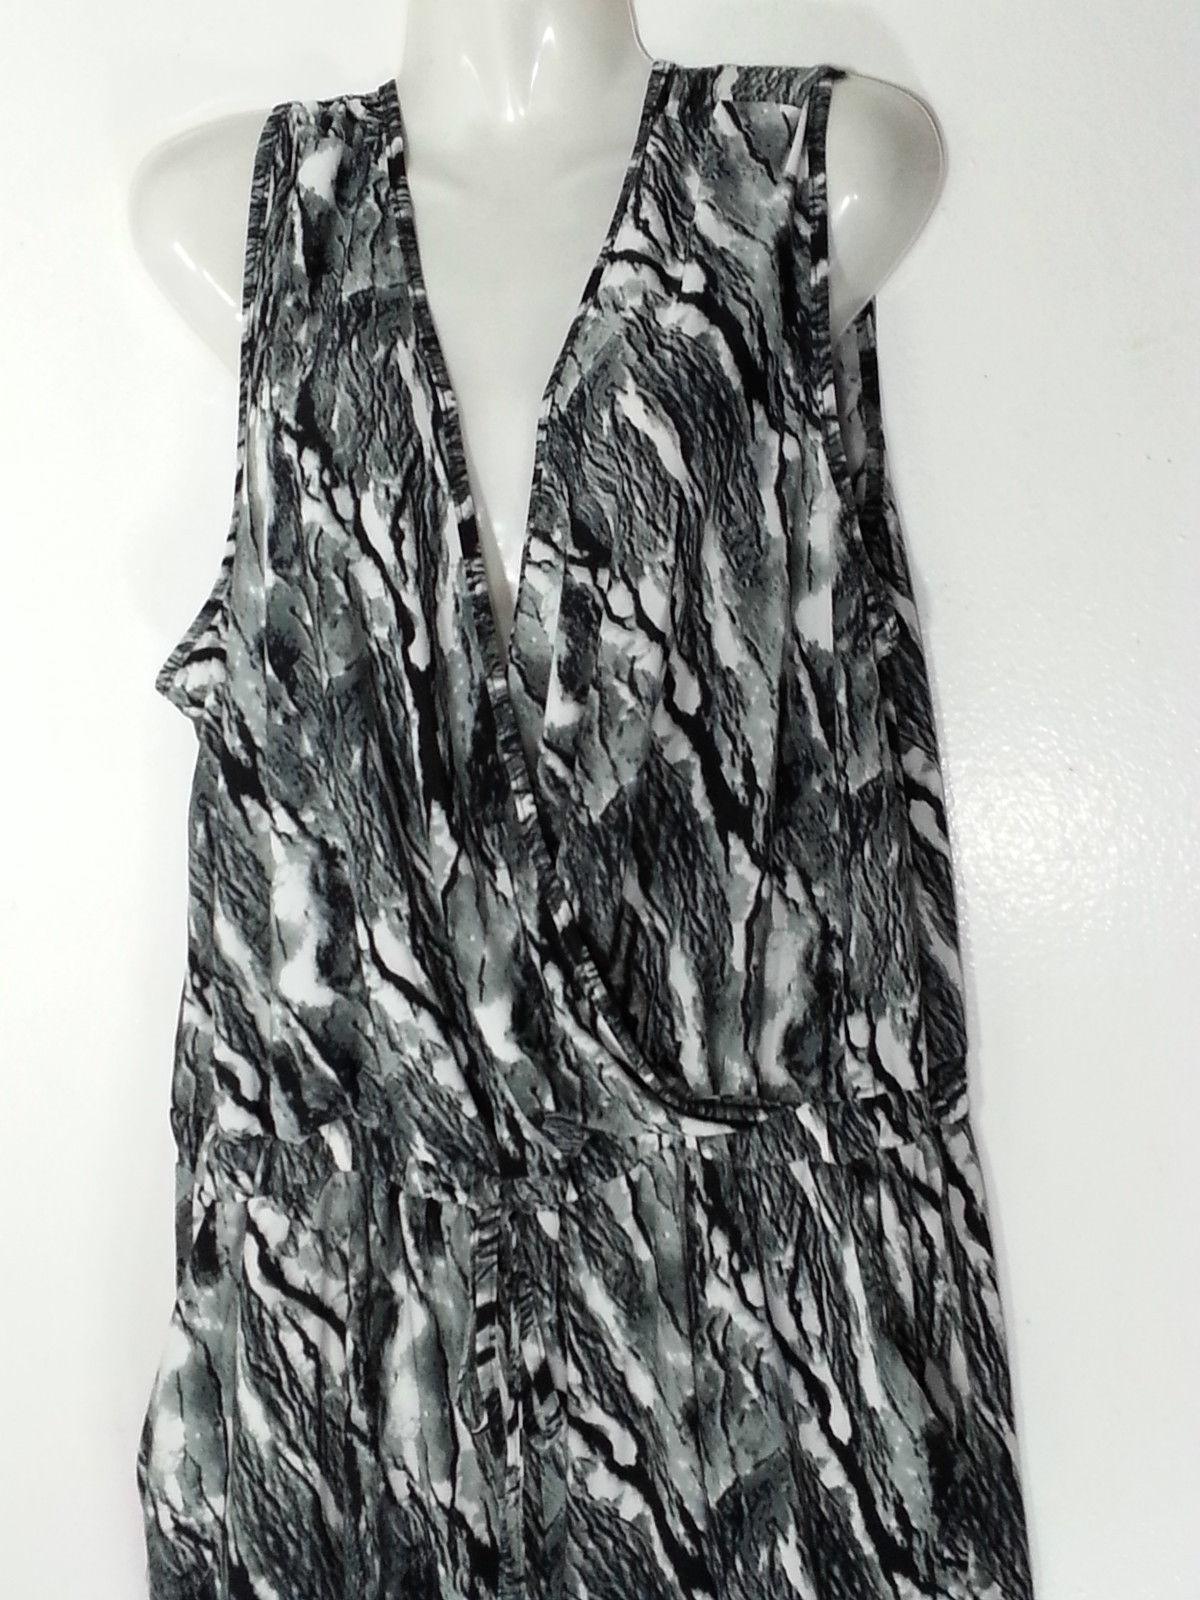 fb28b3774b0 Mlle Gabrielle Jumper Jumpsuit 2X 22-24 and 50 similar items